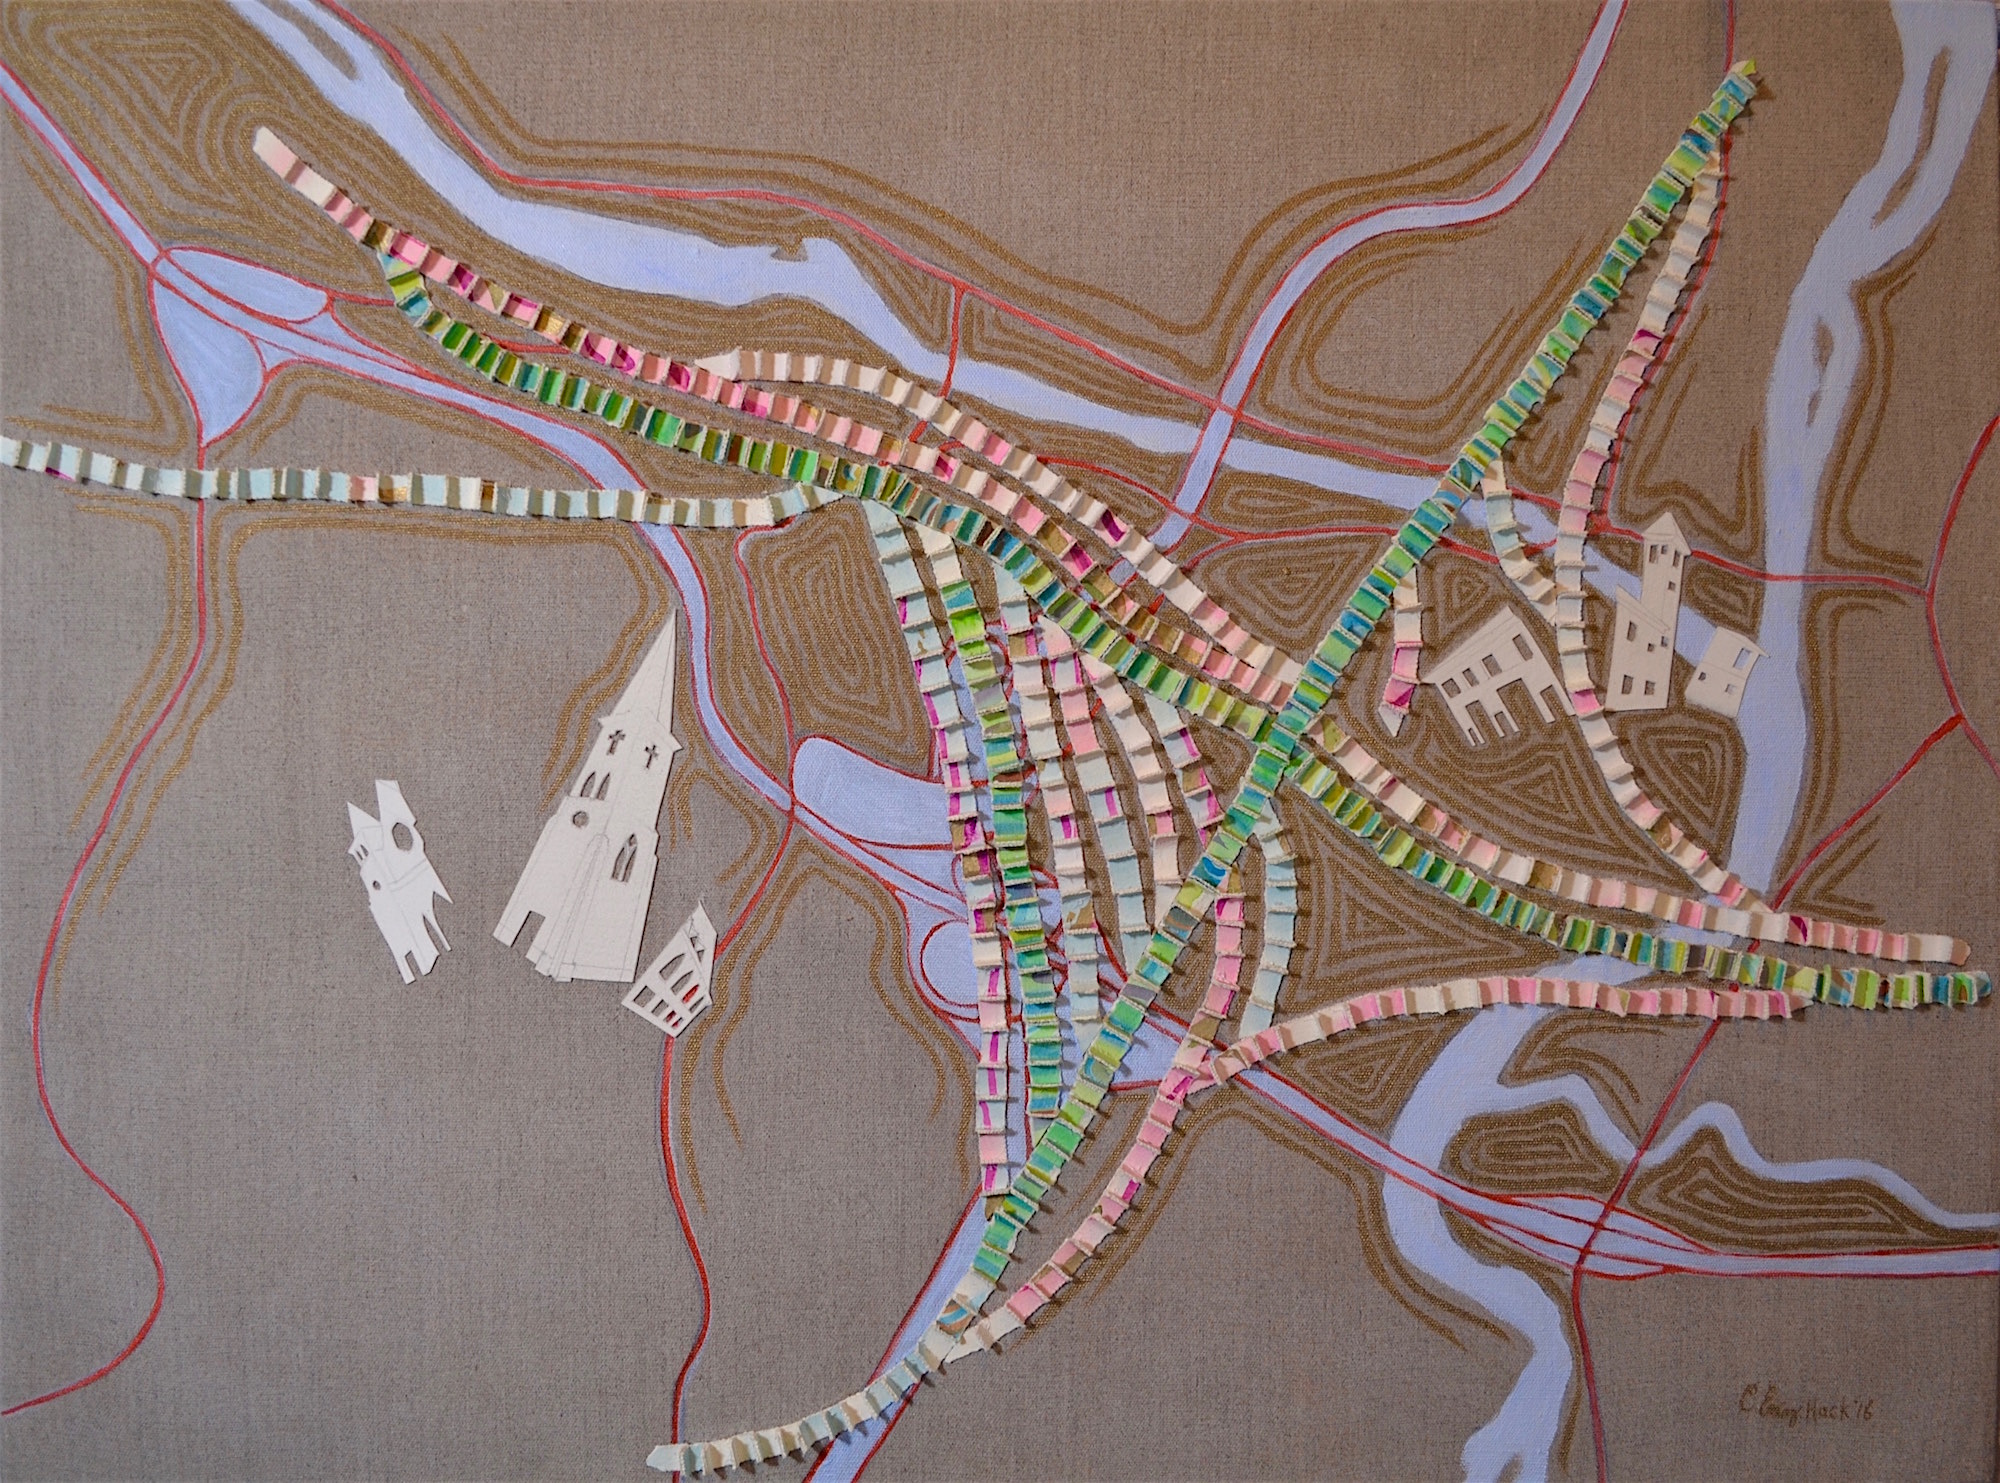 "Confluence, Sidetrack, Interchange - White River Junction, Vermont Carolyn Enz Hack acrylic on linen 30x40"" 2016"